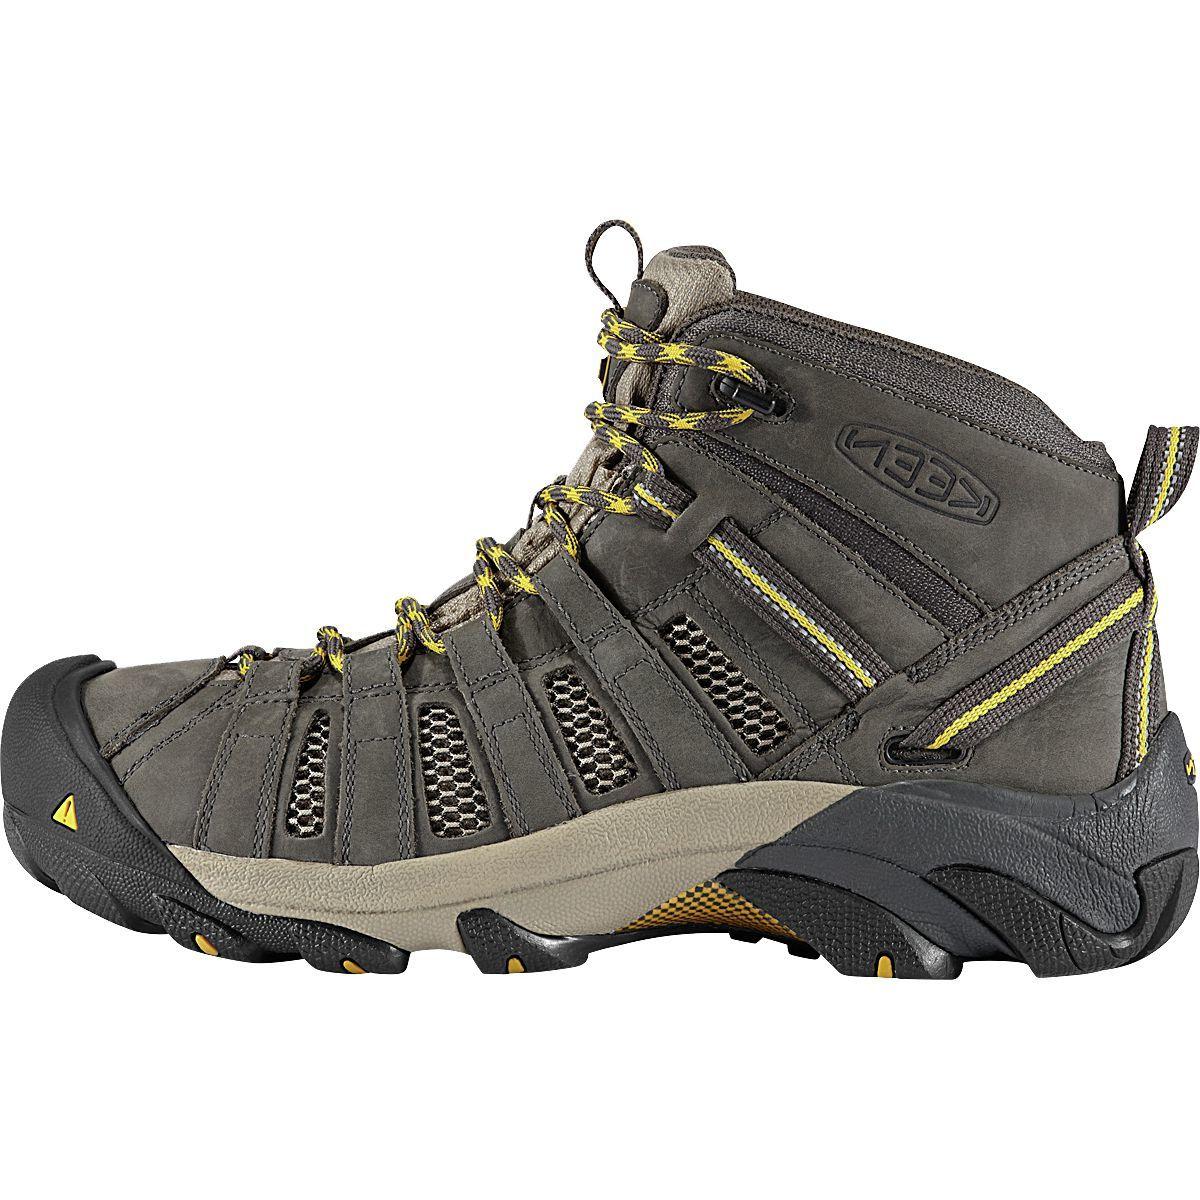 KEEN Voyageur Mid Hiking Boot - Men's